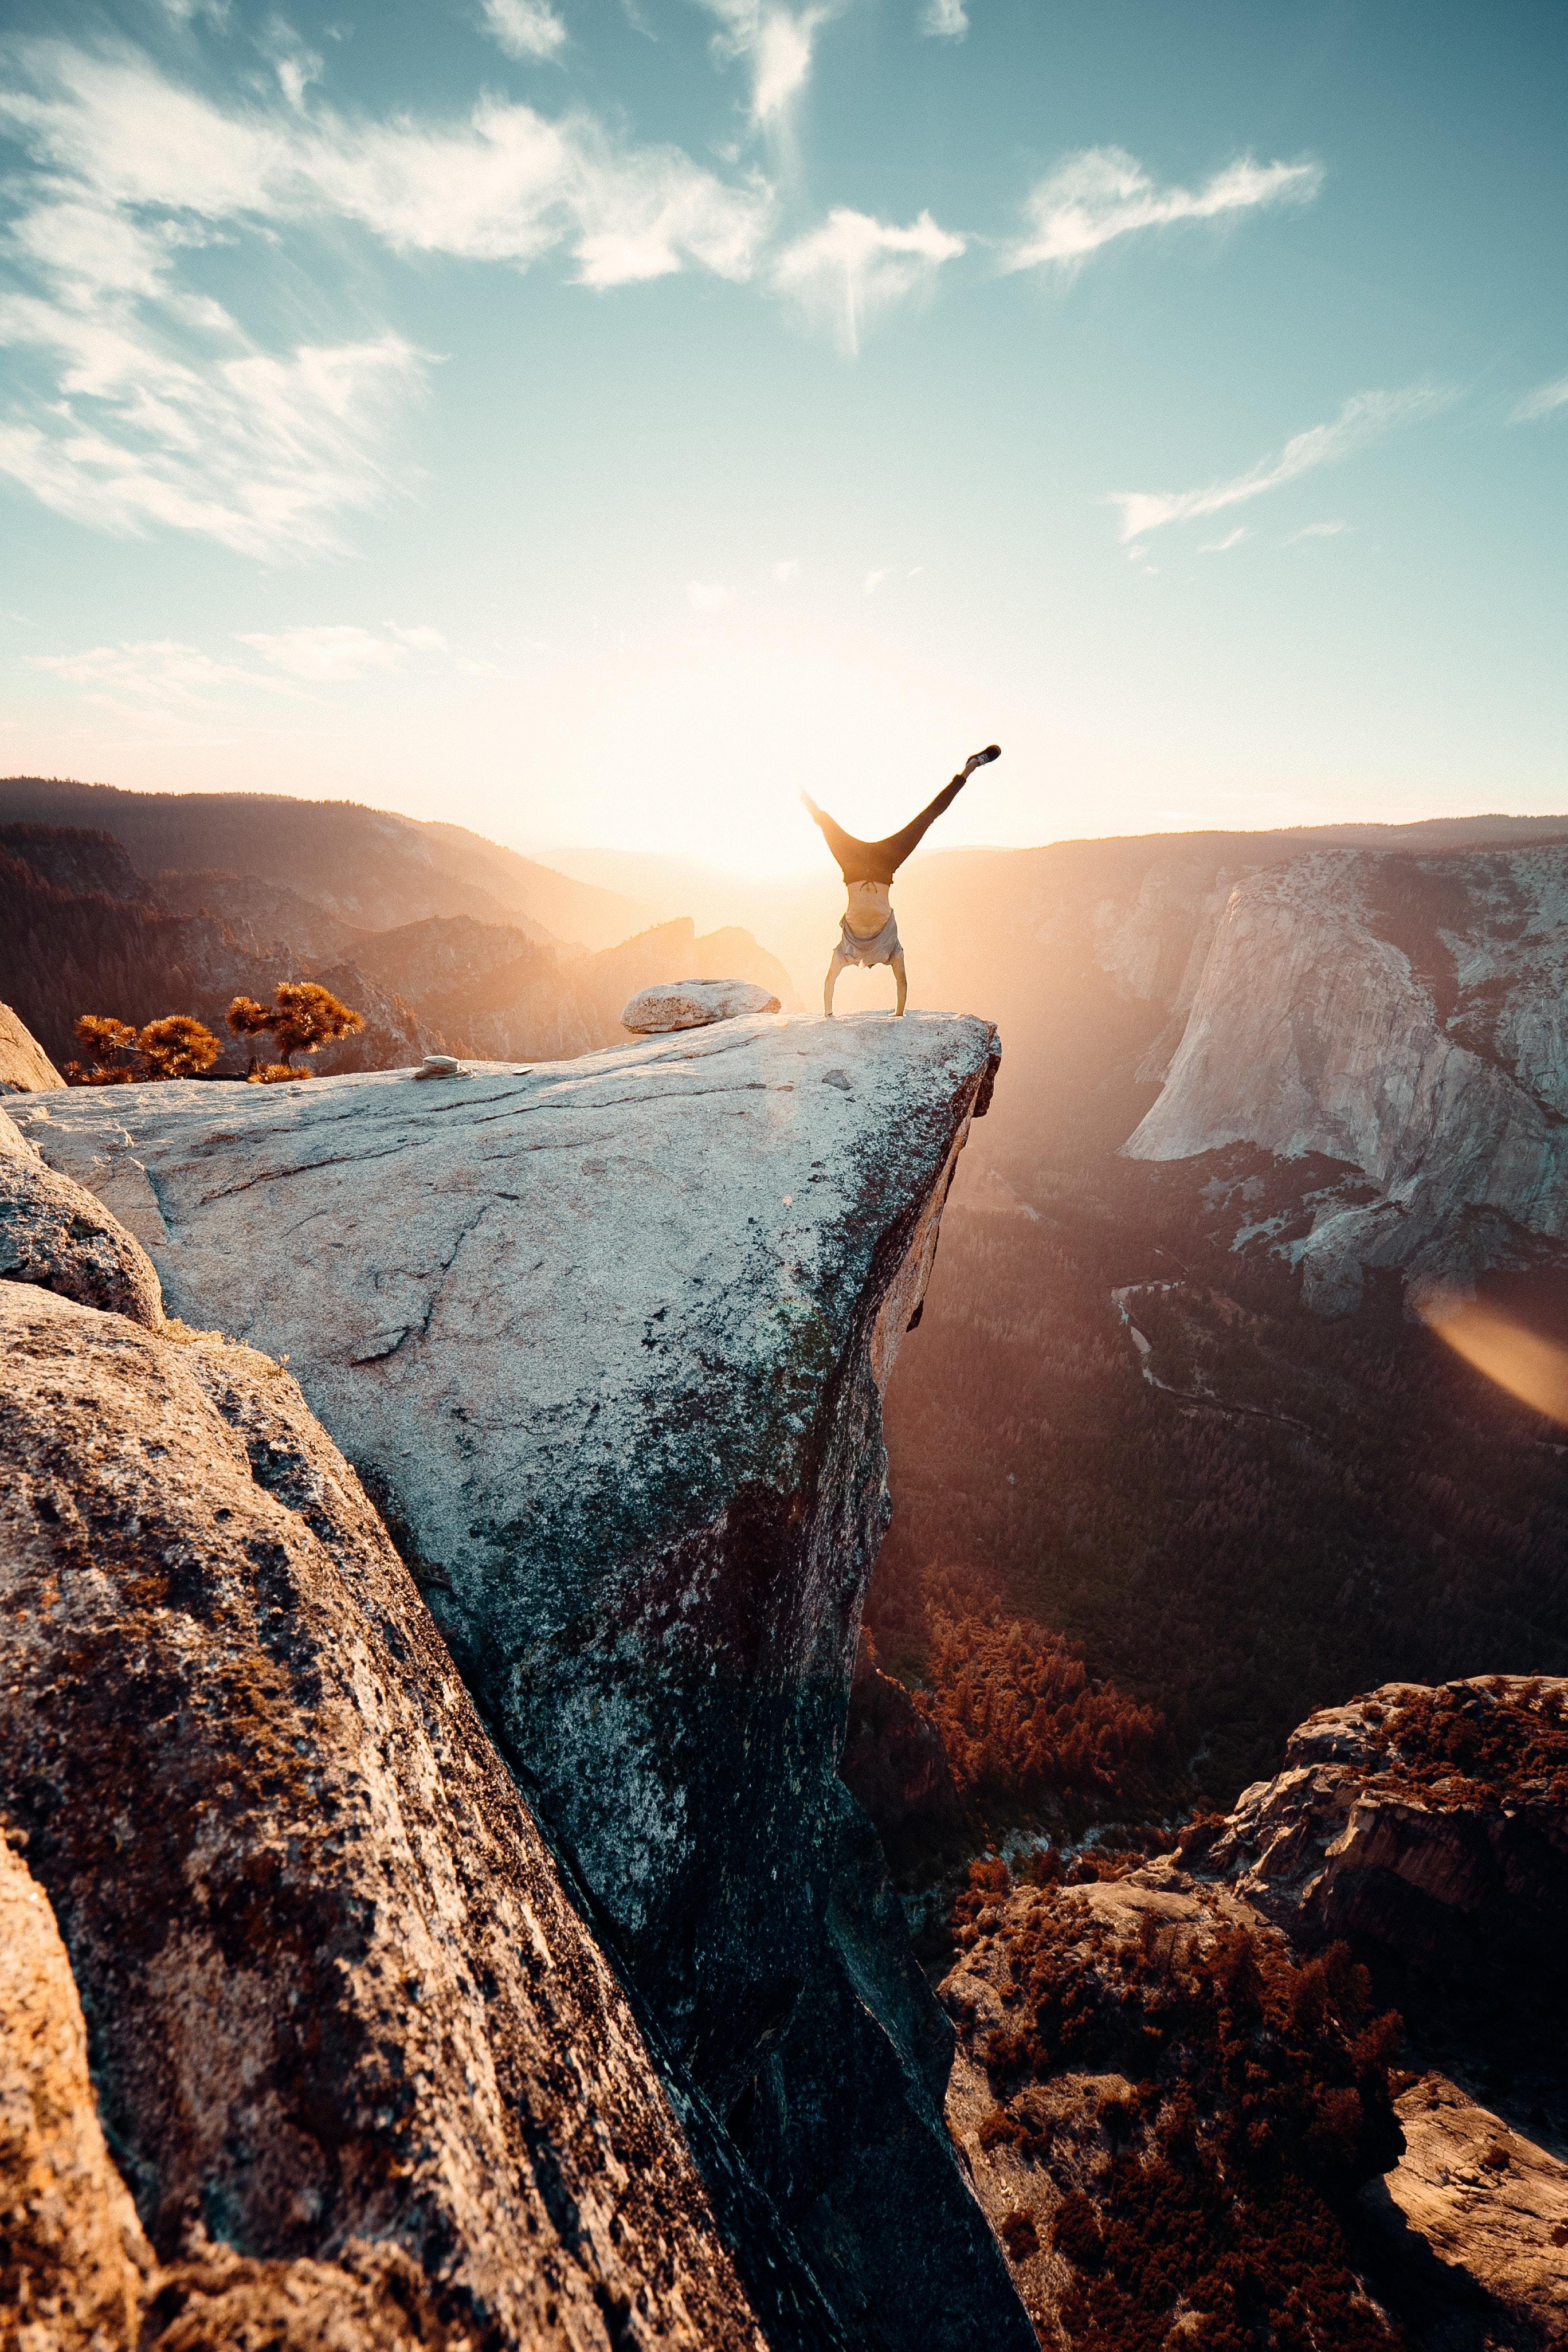 Man doing handstand on rocky hillside